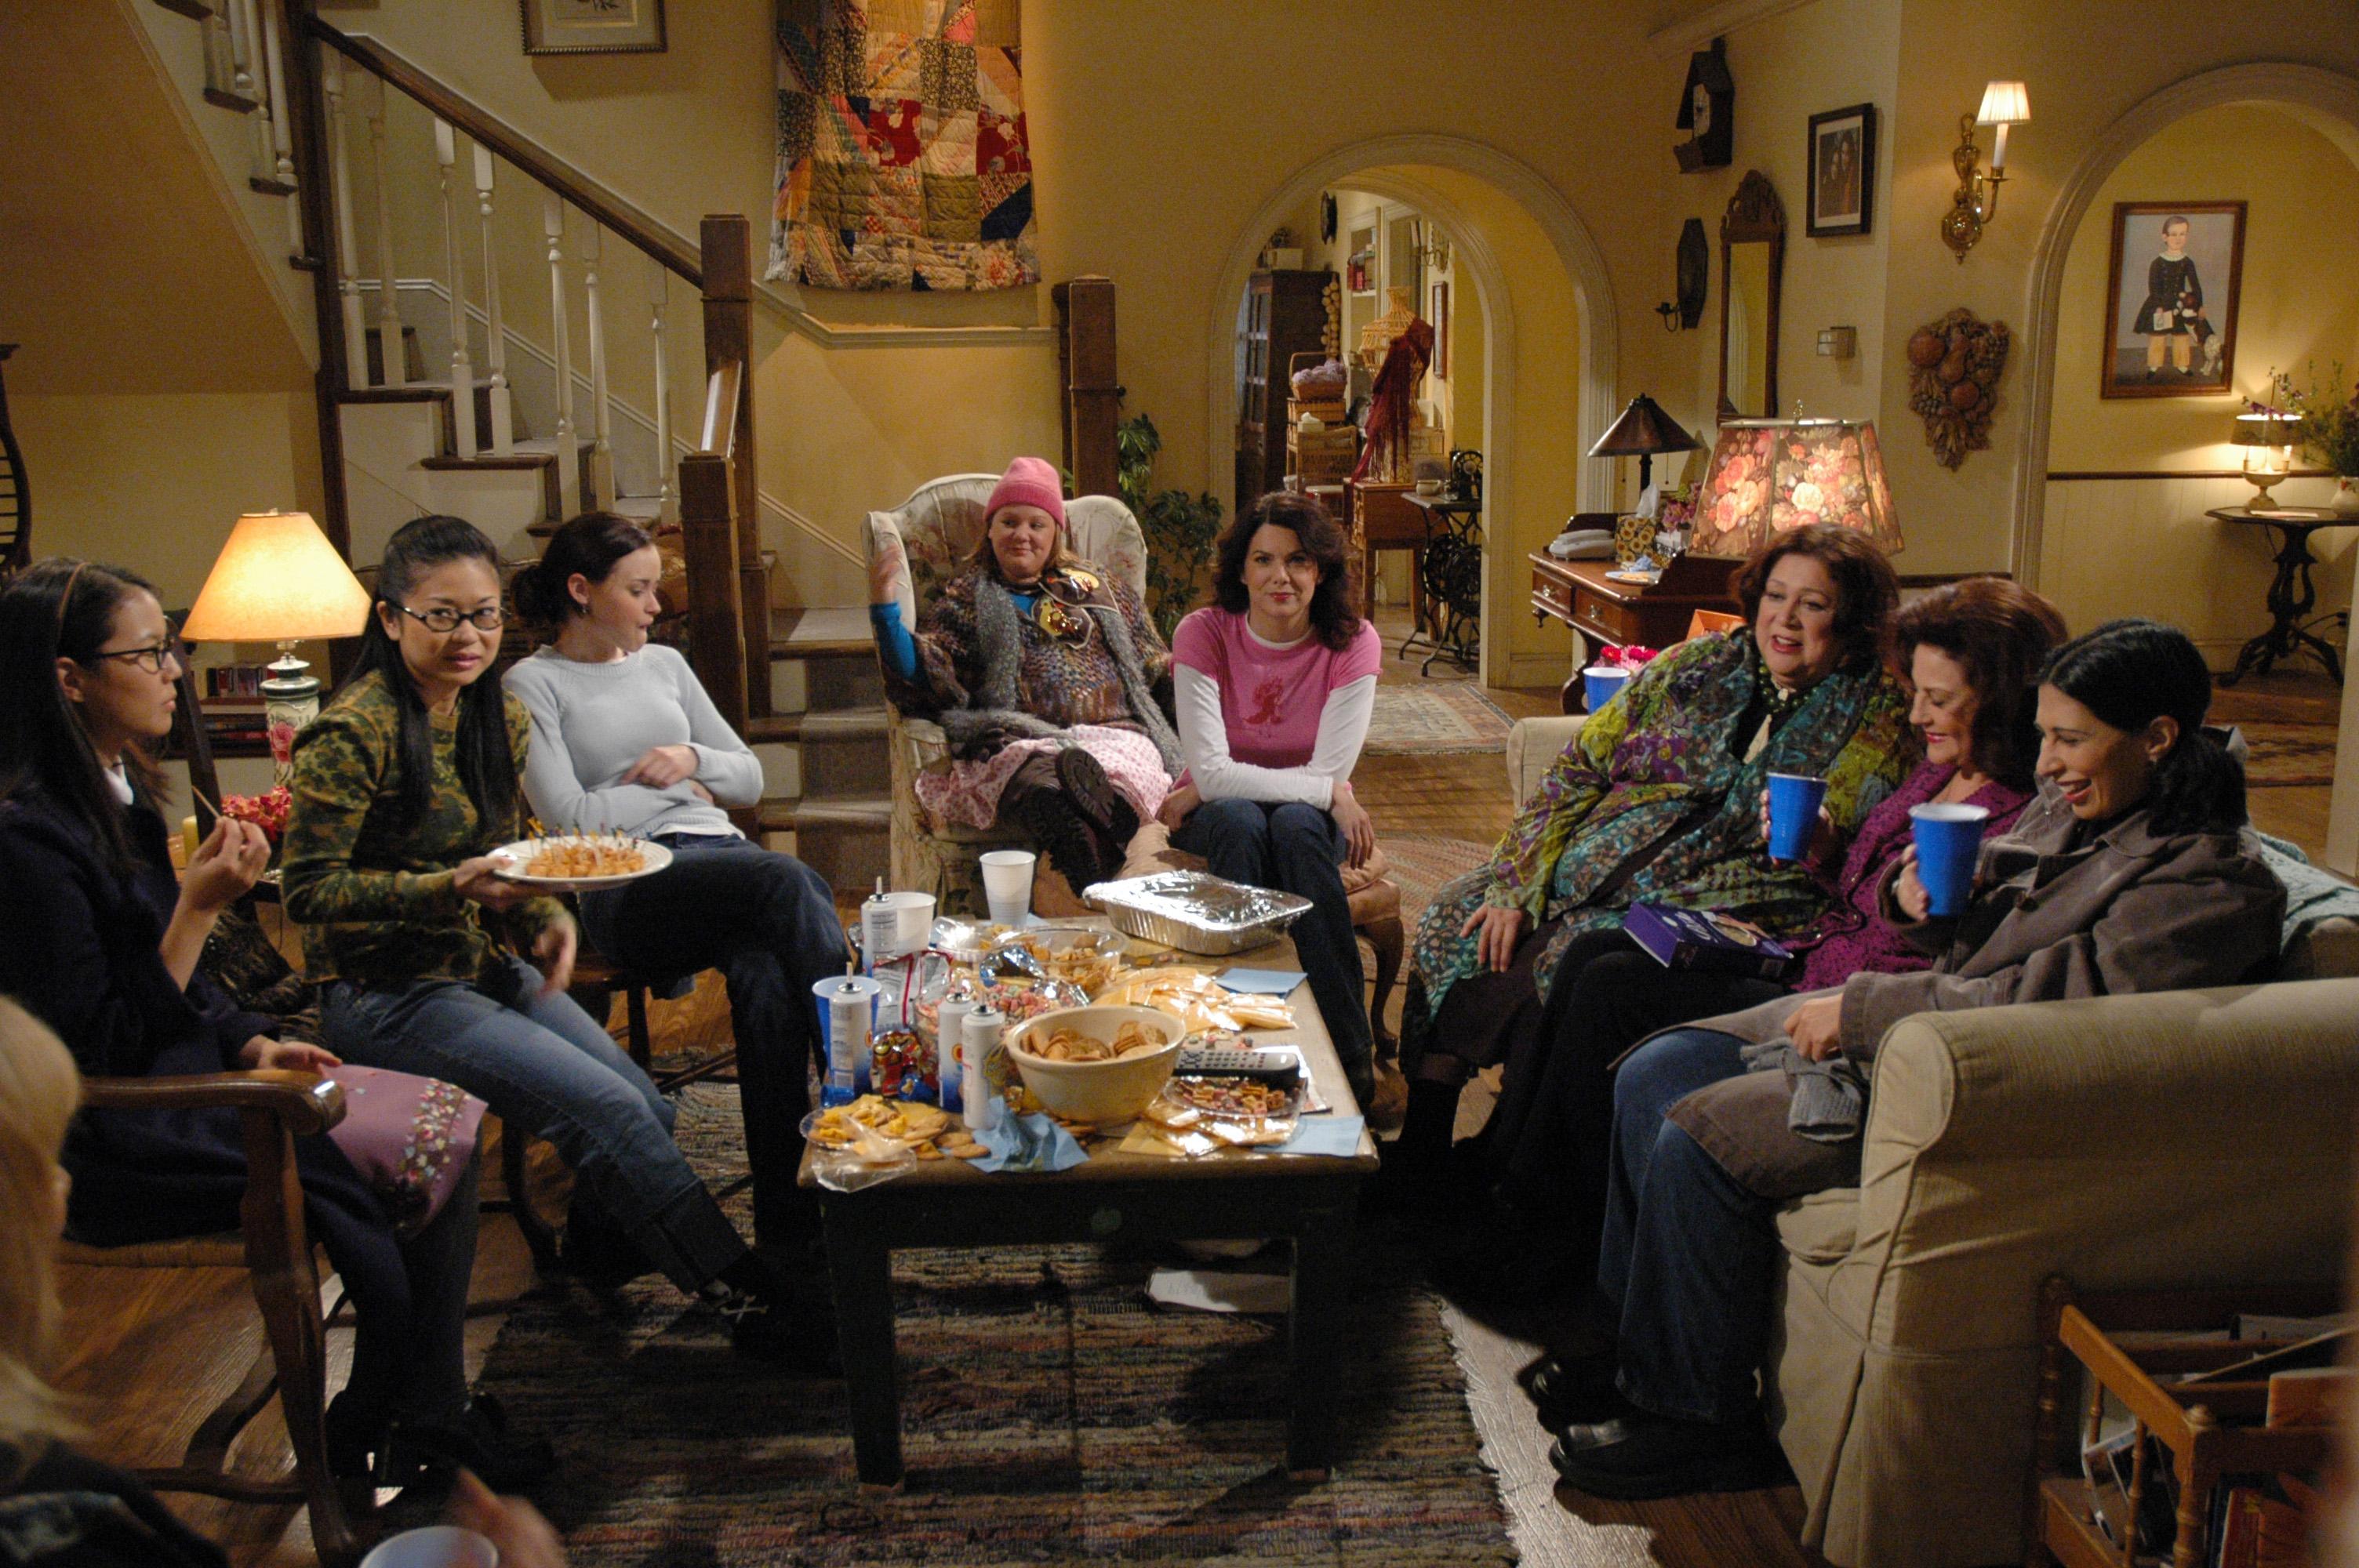 Full shot of (from left) Keiko Agena as Lane, Susane Lee as Kyon, Alexis Bledel as Rory, Melissa McCarthy as Sookie, Lauren Graham as Lorelai, Liz Torres as Miss Patty, Kelly Bishop as Emily, and Rose Abdoo as Gypsy on Gilmore Girls